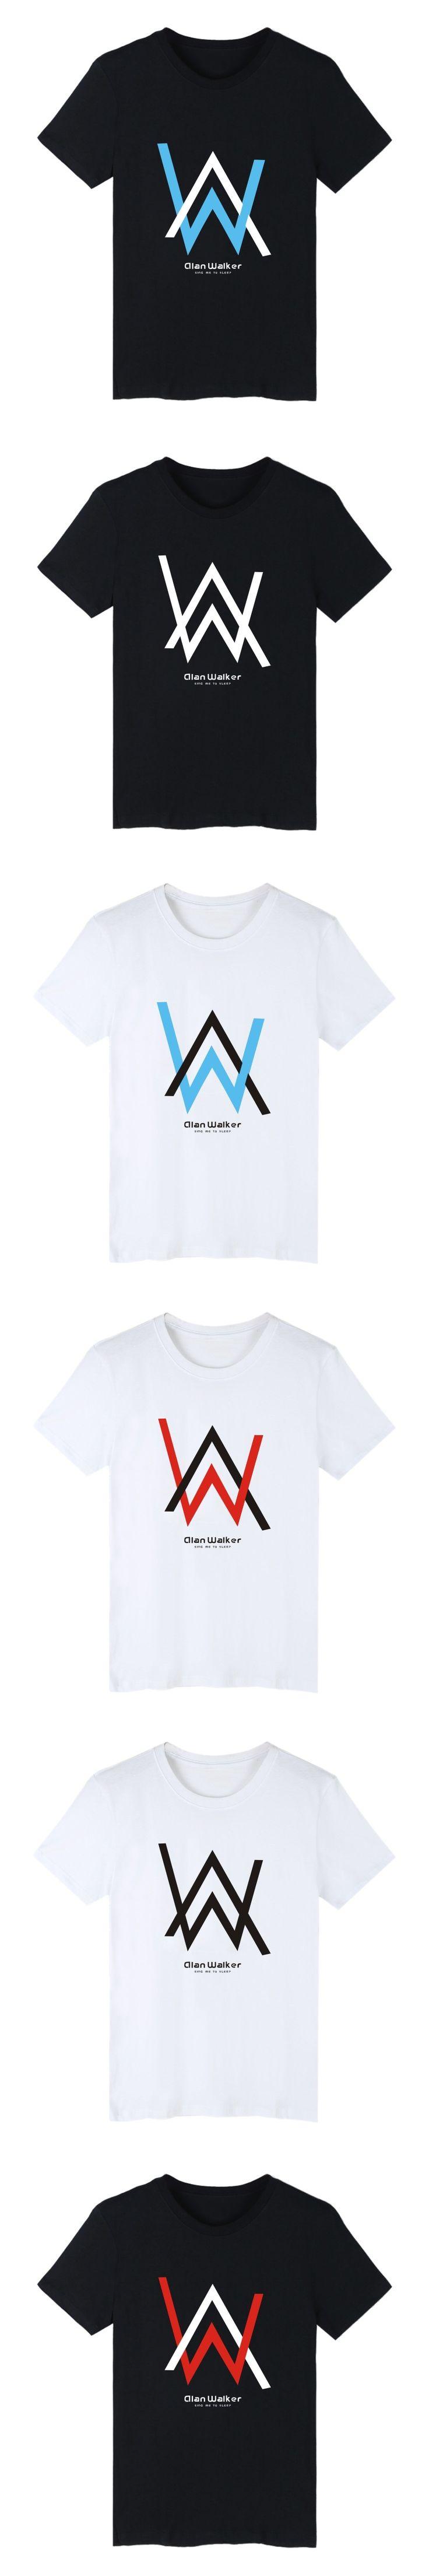 BATIGOL Alan Walker Singer Short Sleeve Tee Shirt Men Cotton Summer Tshirt Men Brand World Famous Electronic Music Tshirt Men